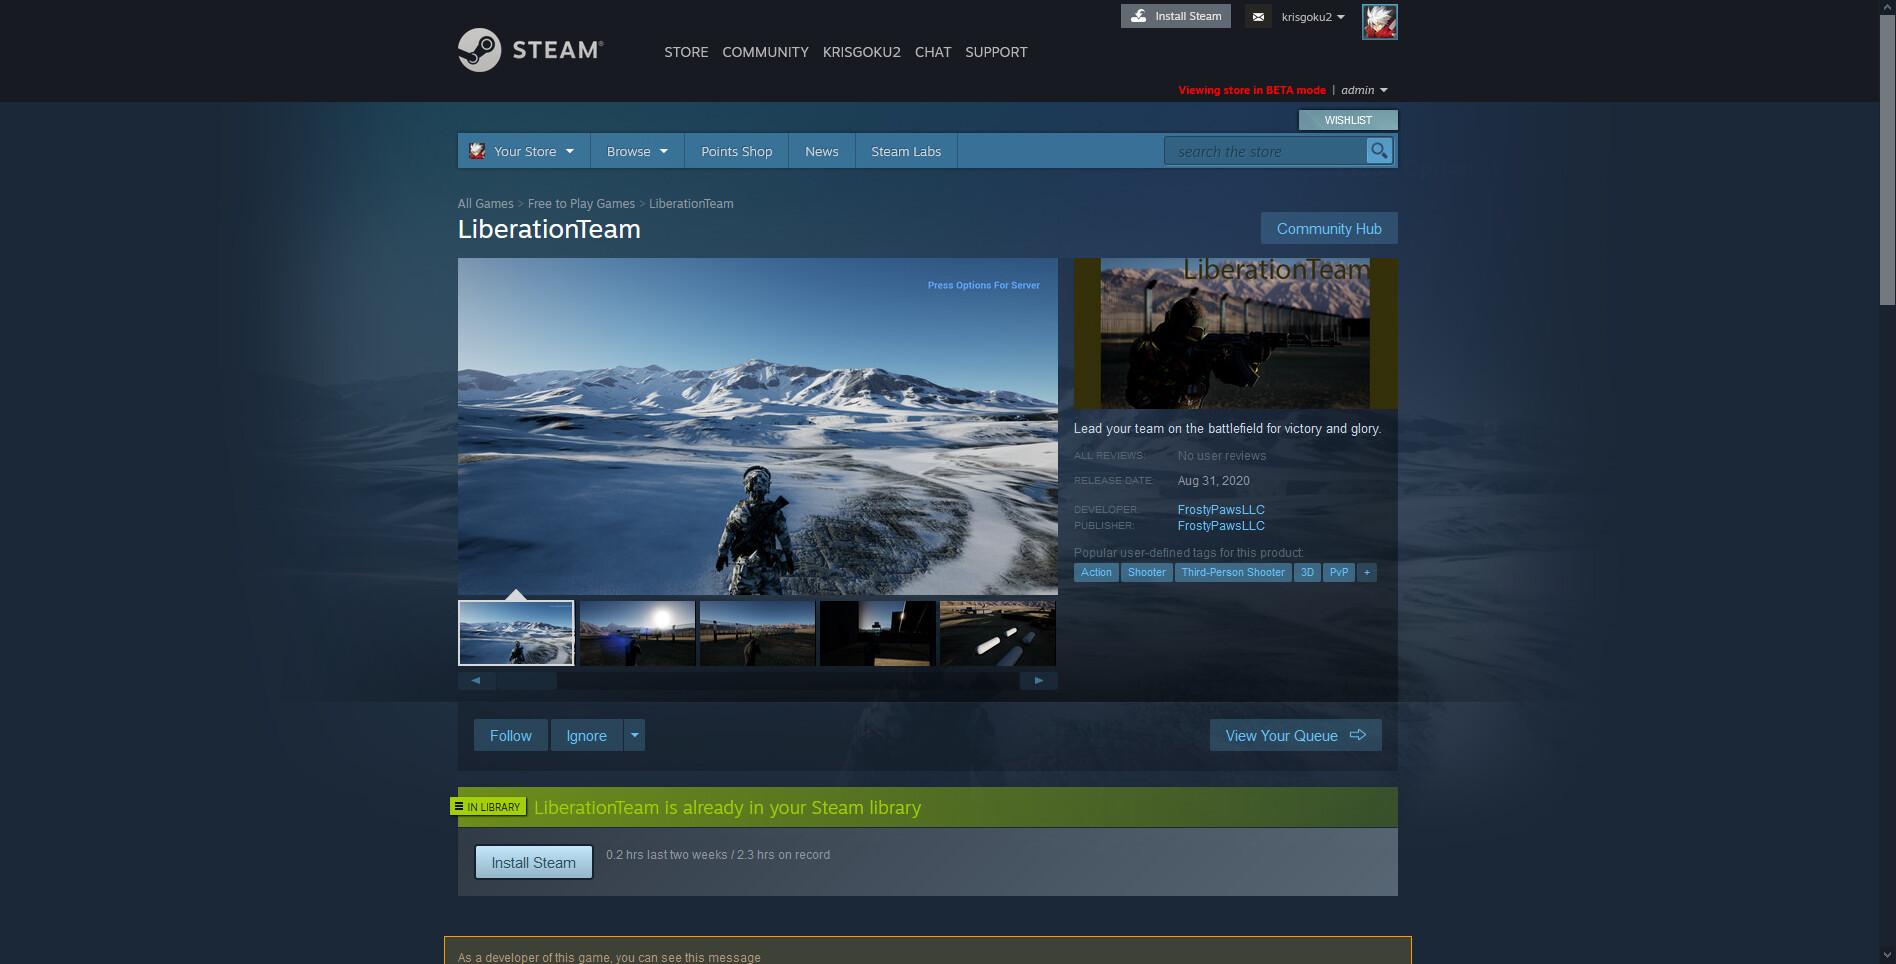 LiberationTeam on Steam - Mozilla Firefox 8_17_2020 2_26_22 PM.jpg